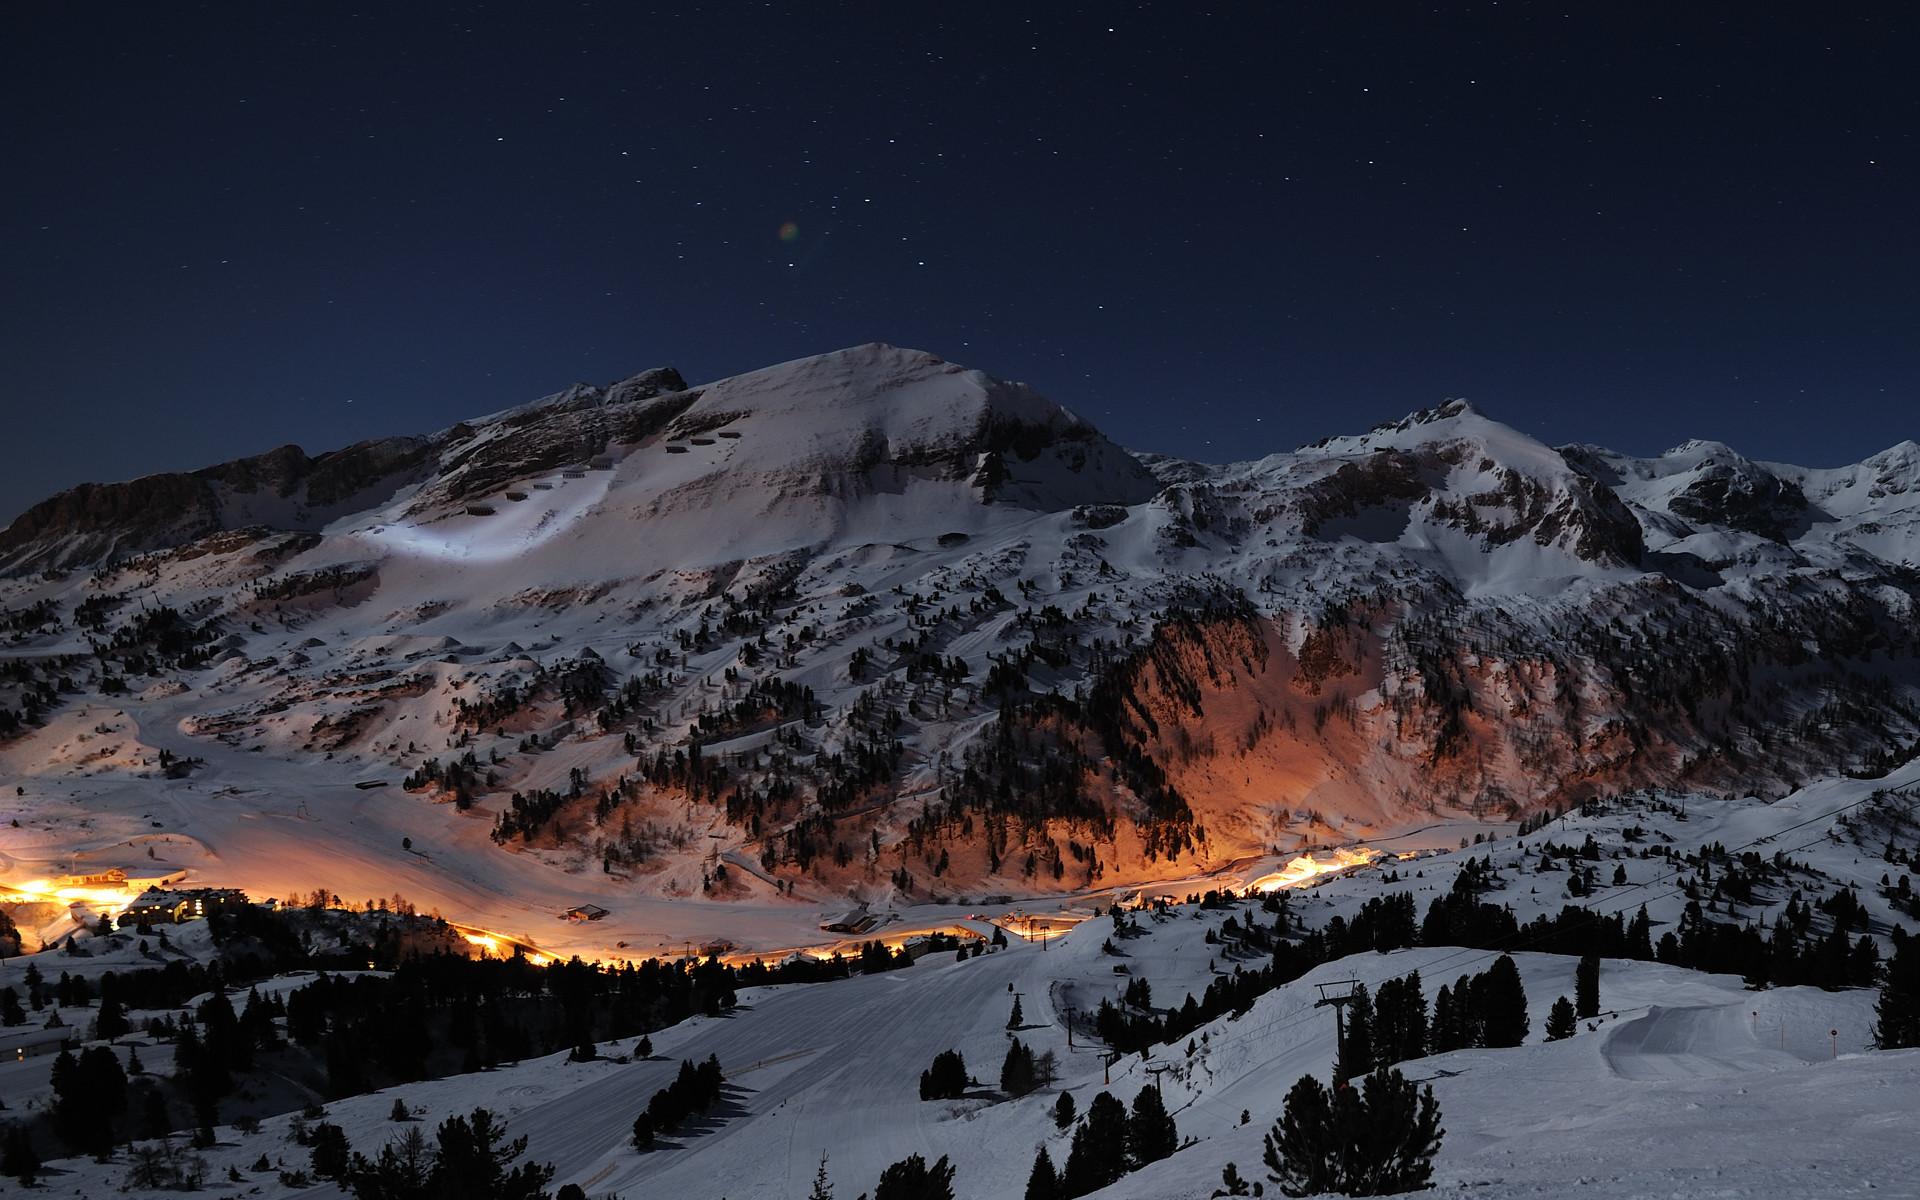 Snowy Mountains Wallpaper 3446